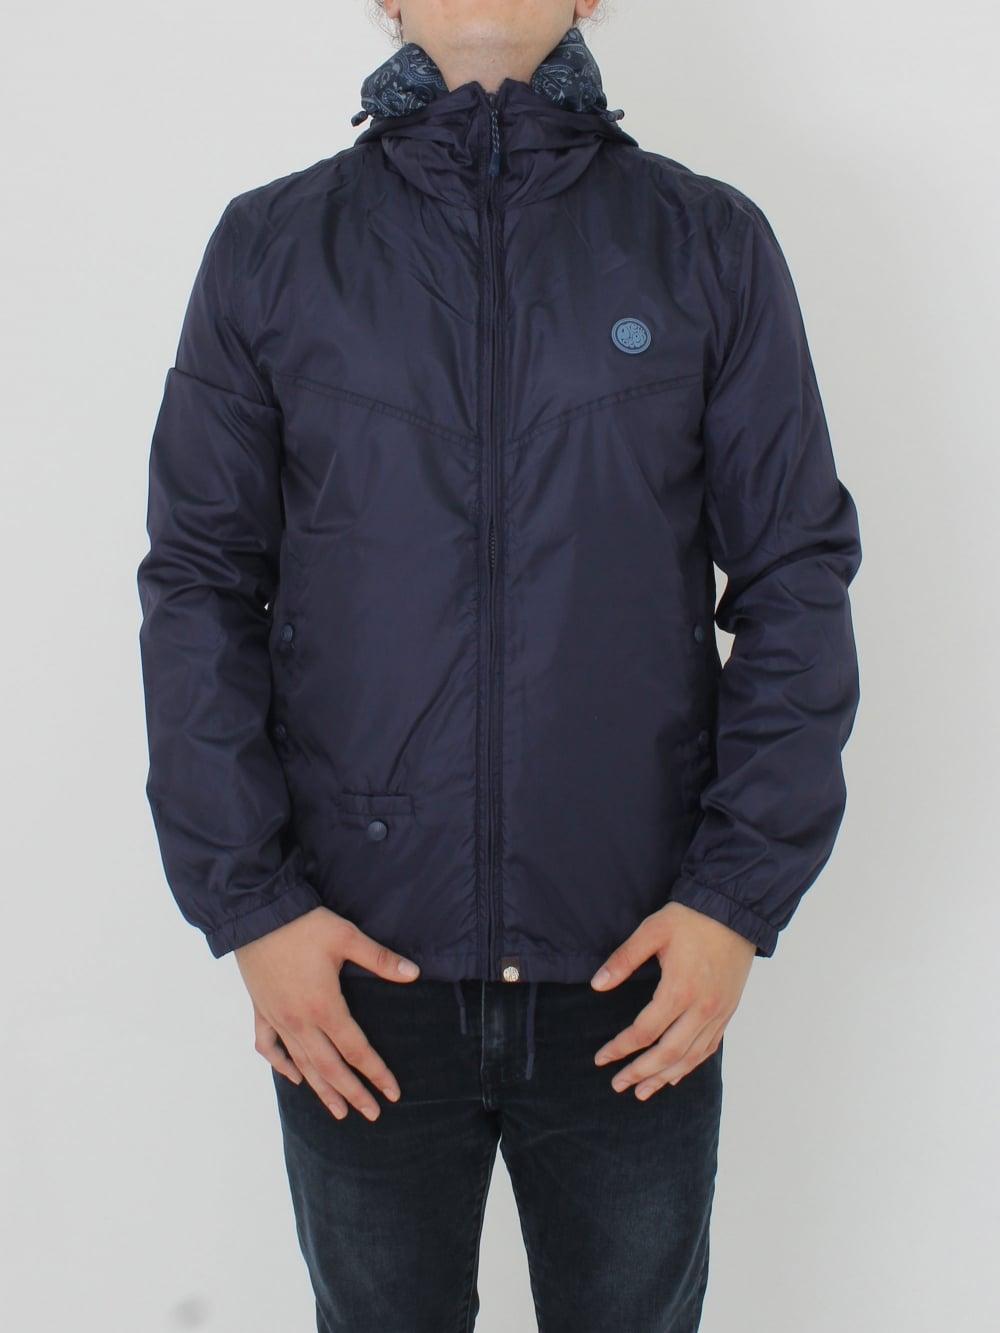 6aad03d8dbe Darley Zip Up Hooded Jacket - Navy